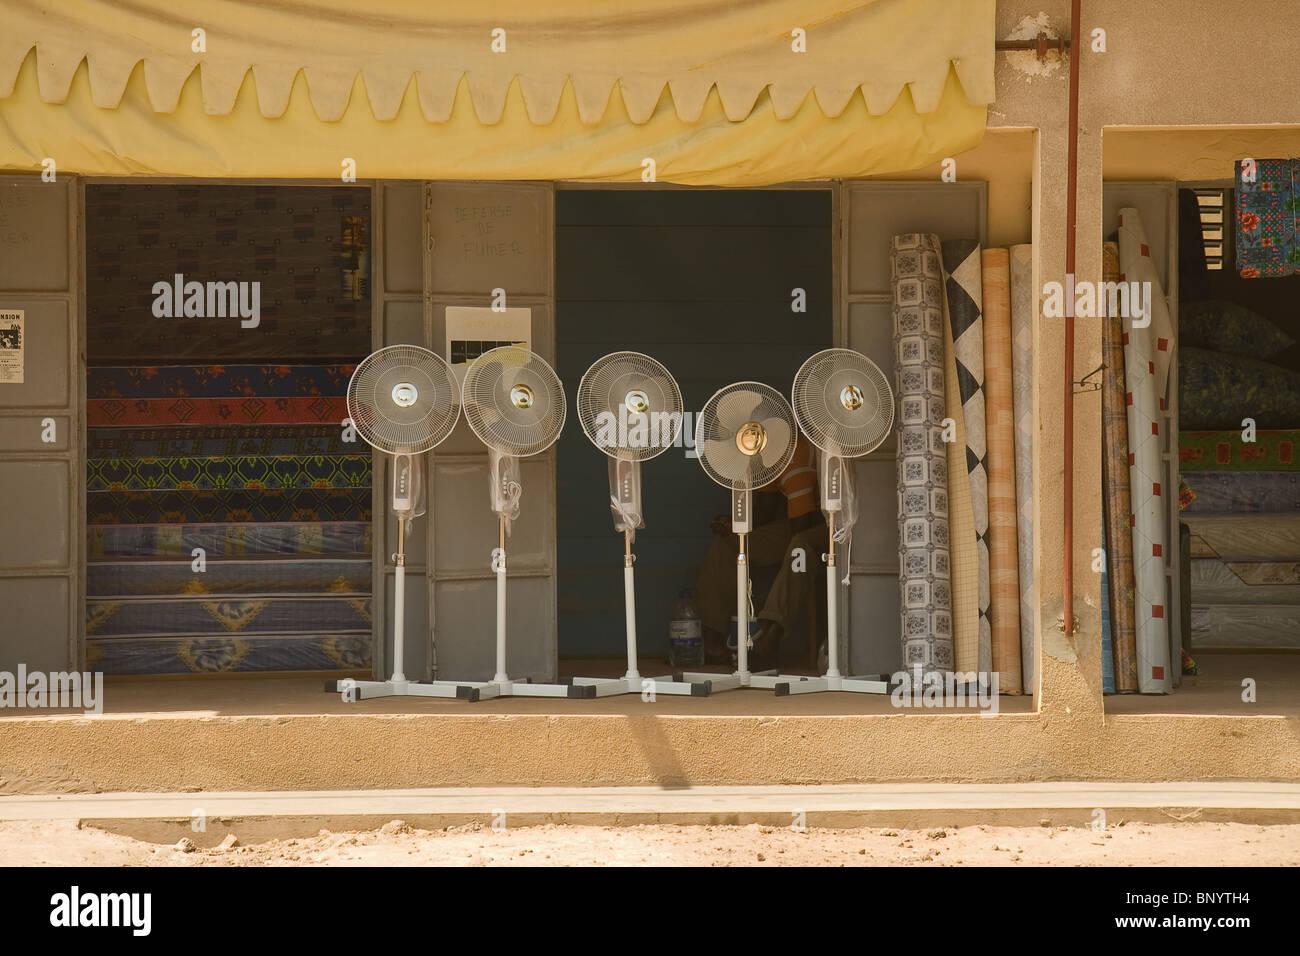 Ventilatori elettrici in Senegal Immagini Stock